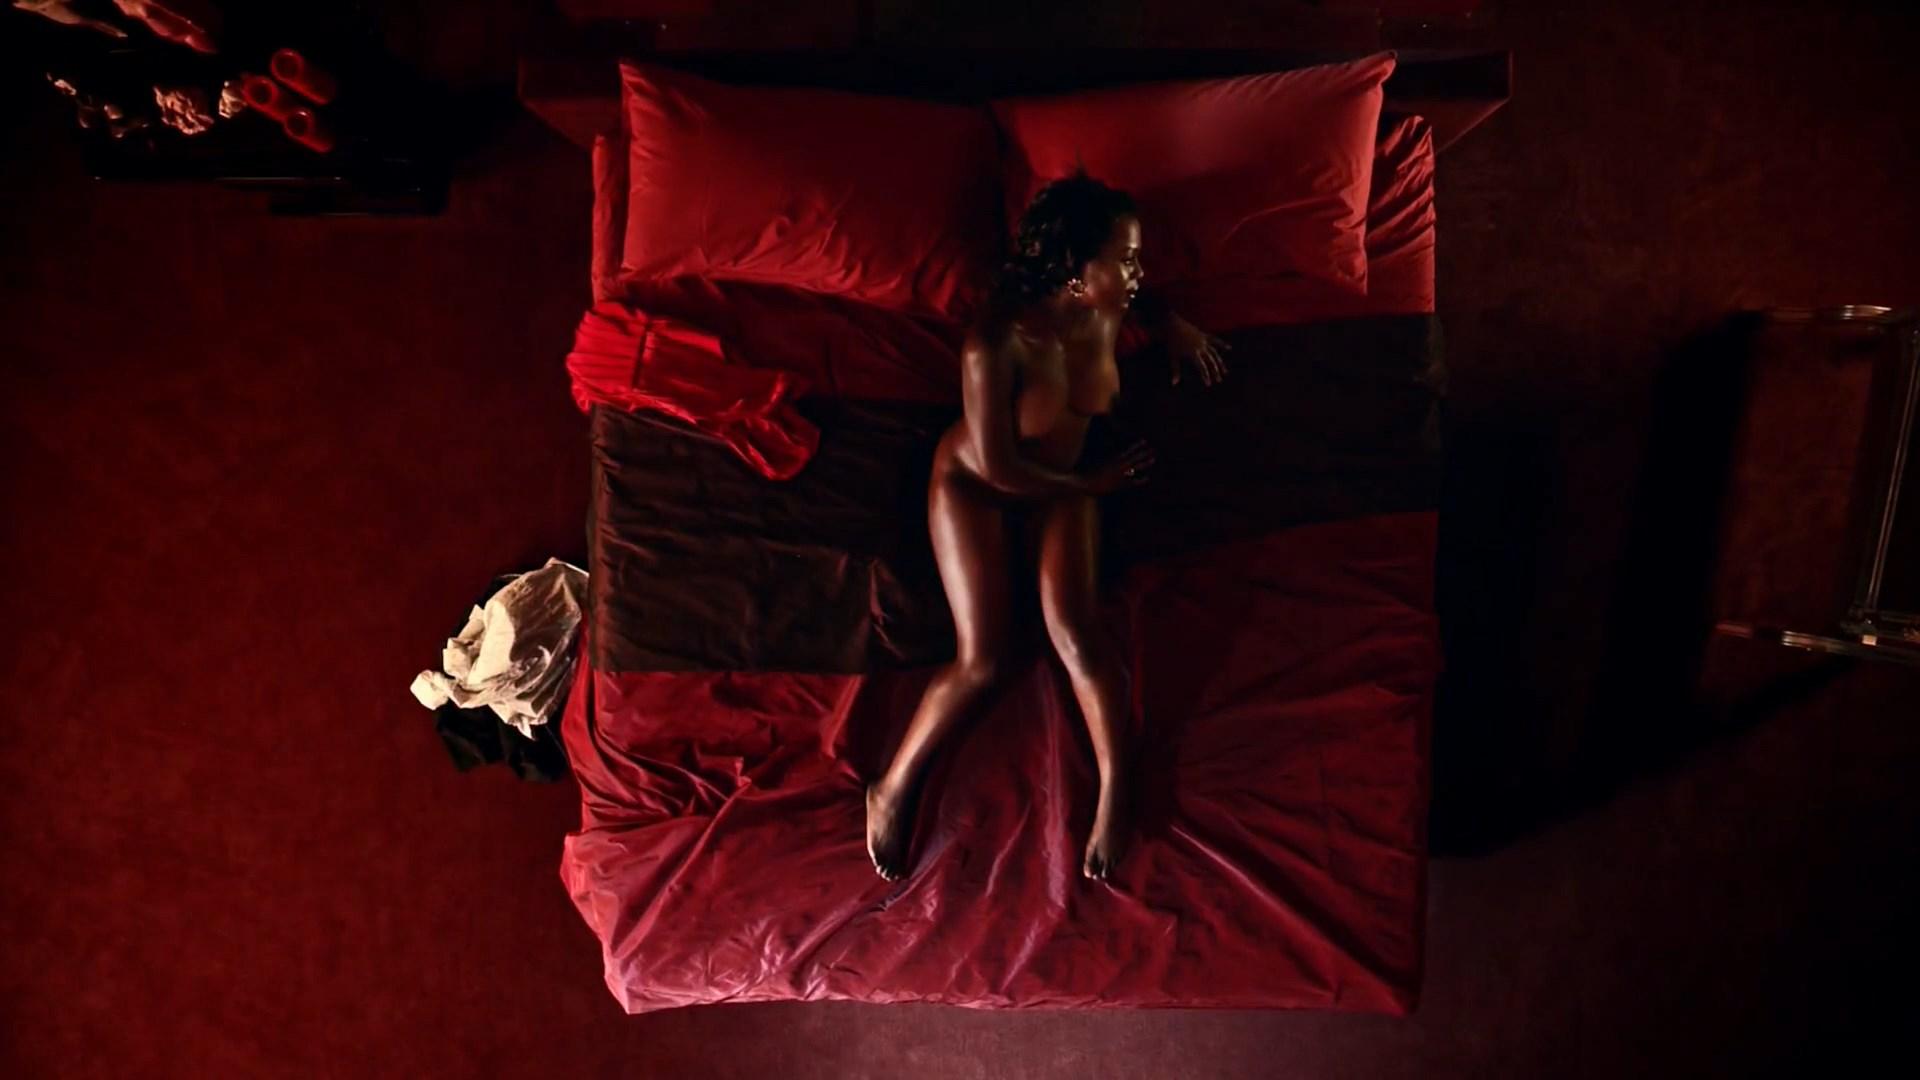 Alicia Machado nudes (93 photos), Sexy, Cleavage, Feet, butt 2020